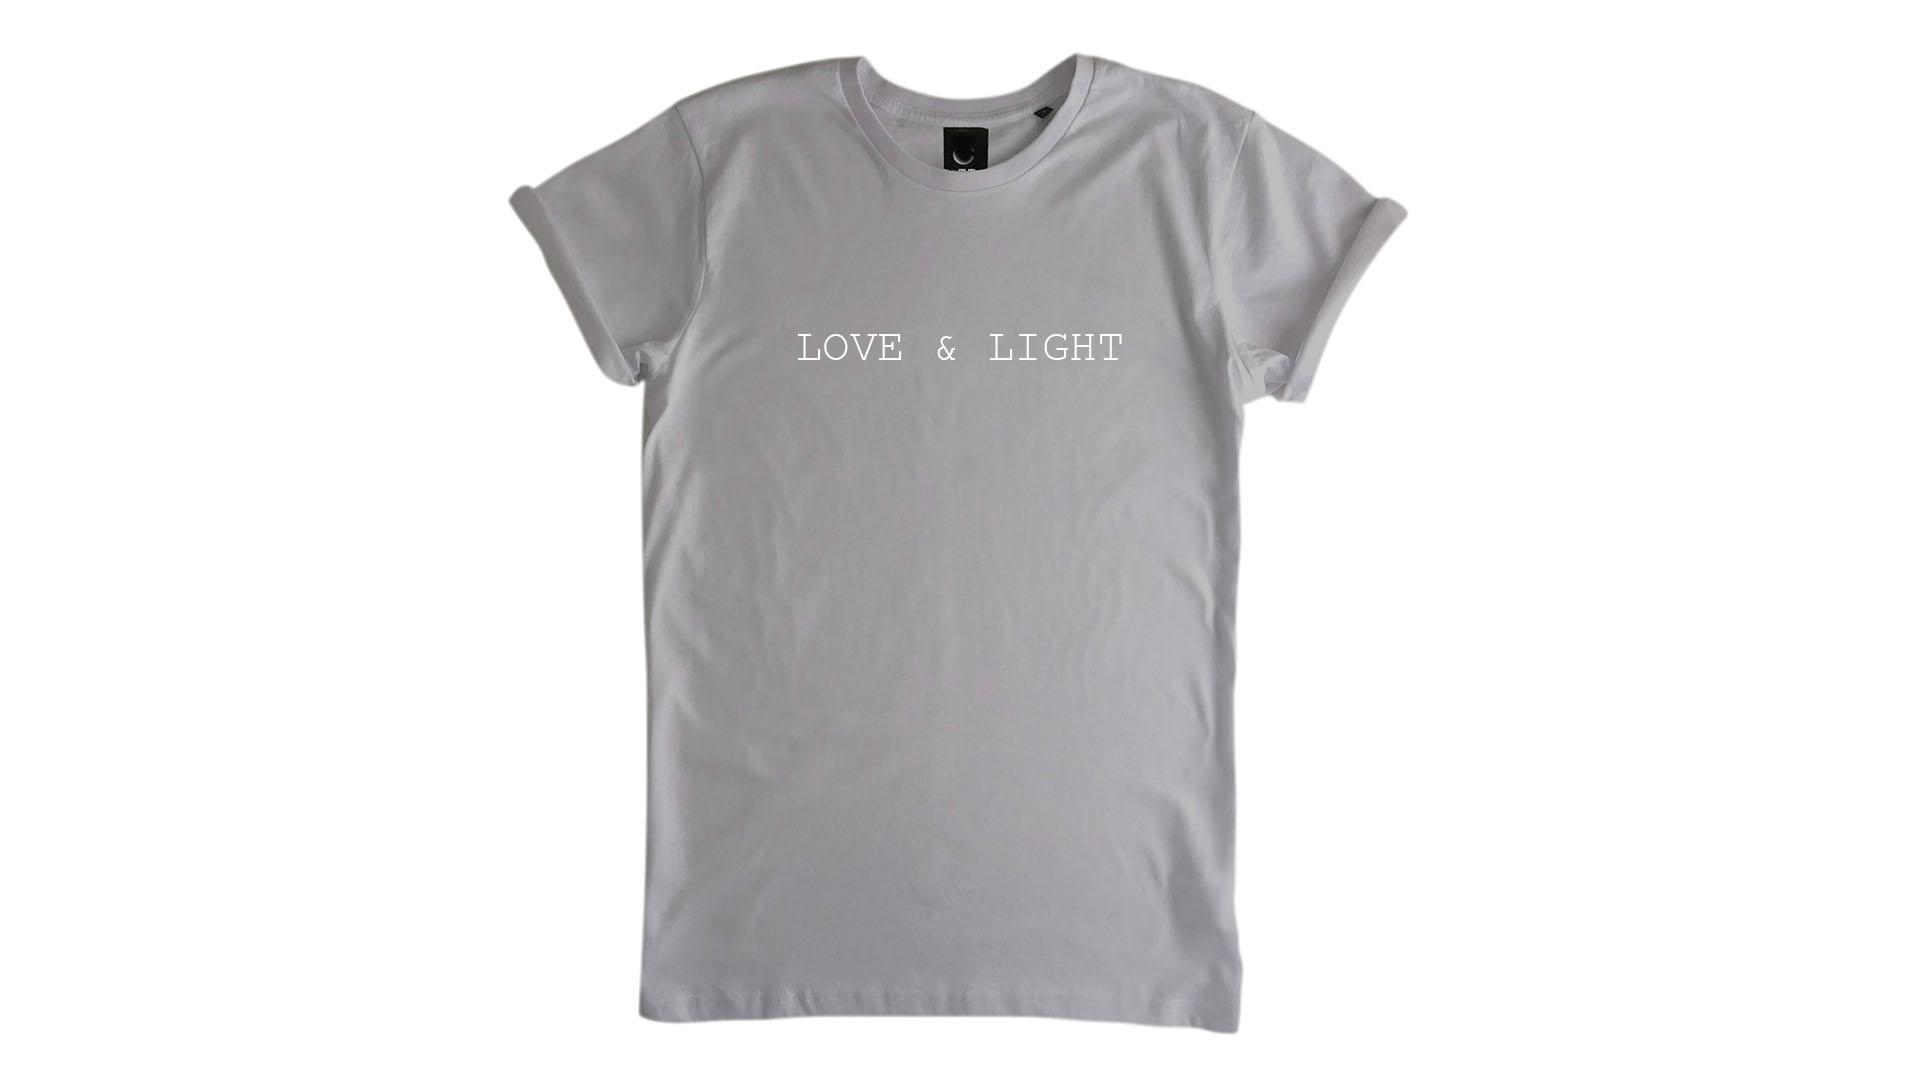 LiveLearn.Yoga Yoga T-Shirt Organic Cotton Love & Light Light Grey